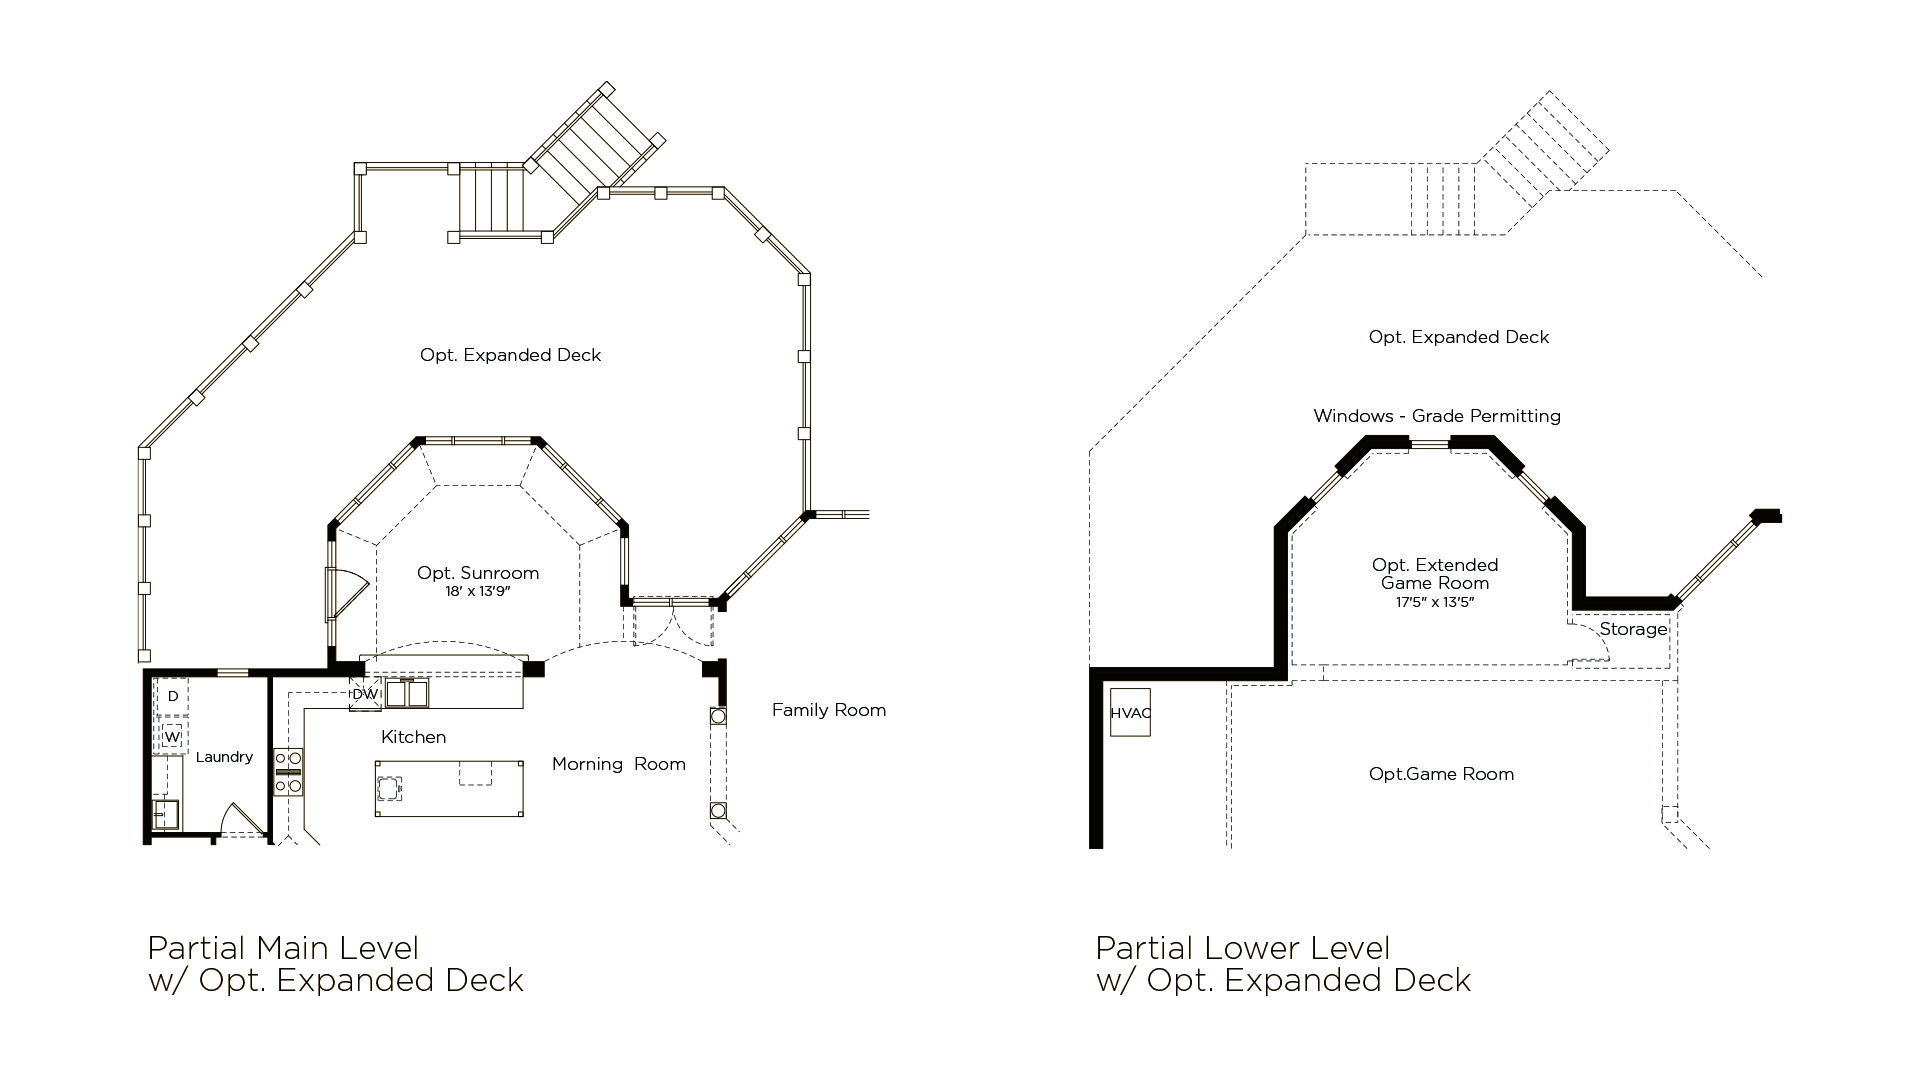 Winthrop - Summerwood Series - Optional Expanded Deck